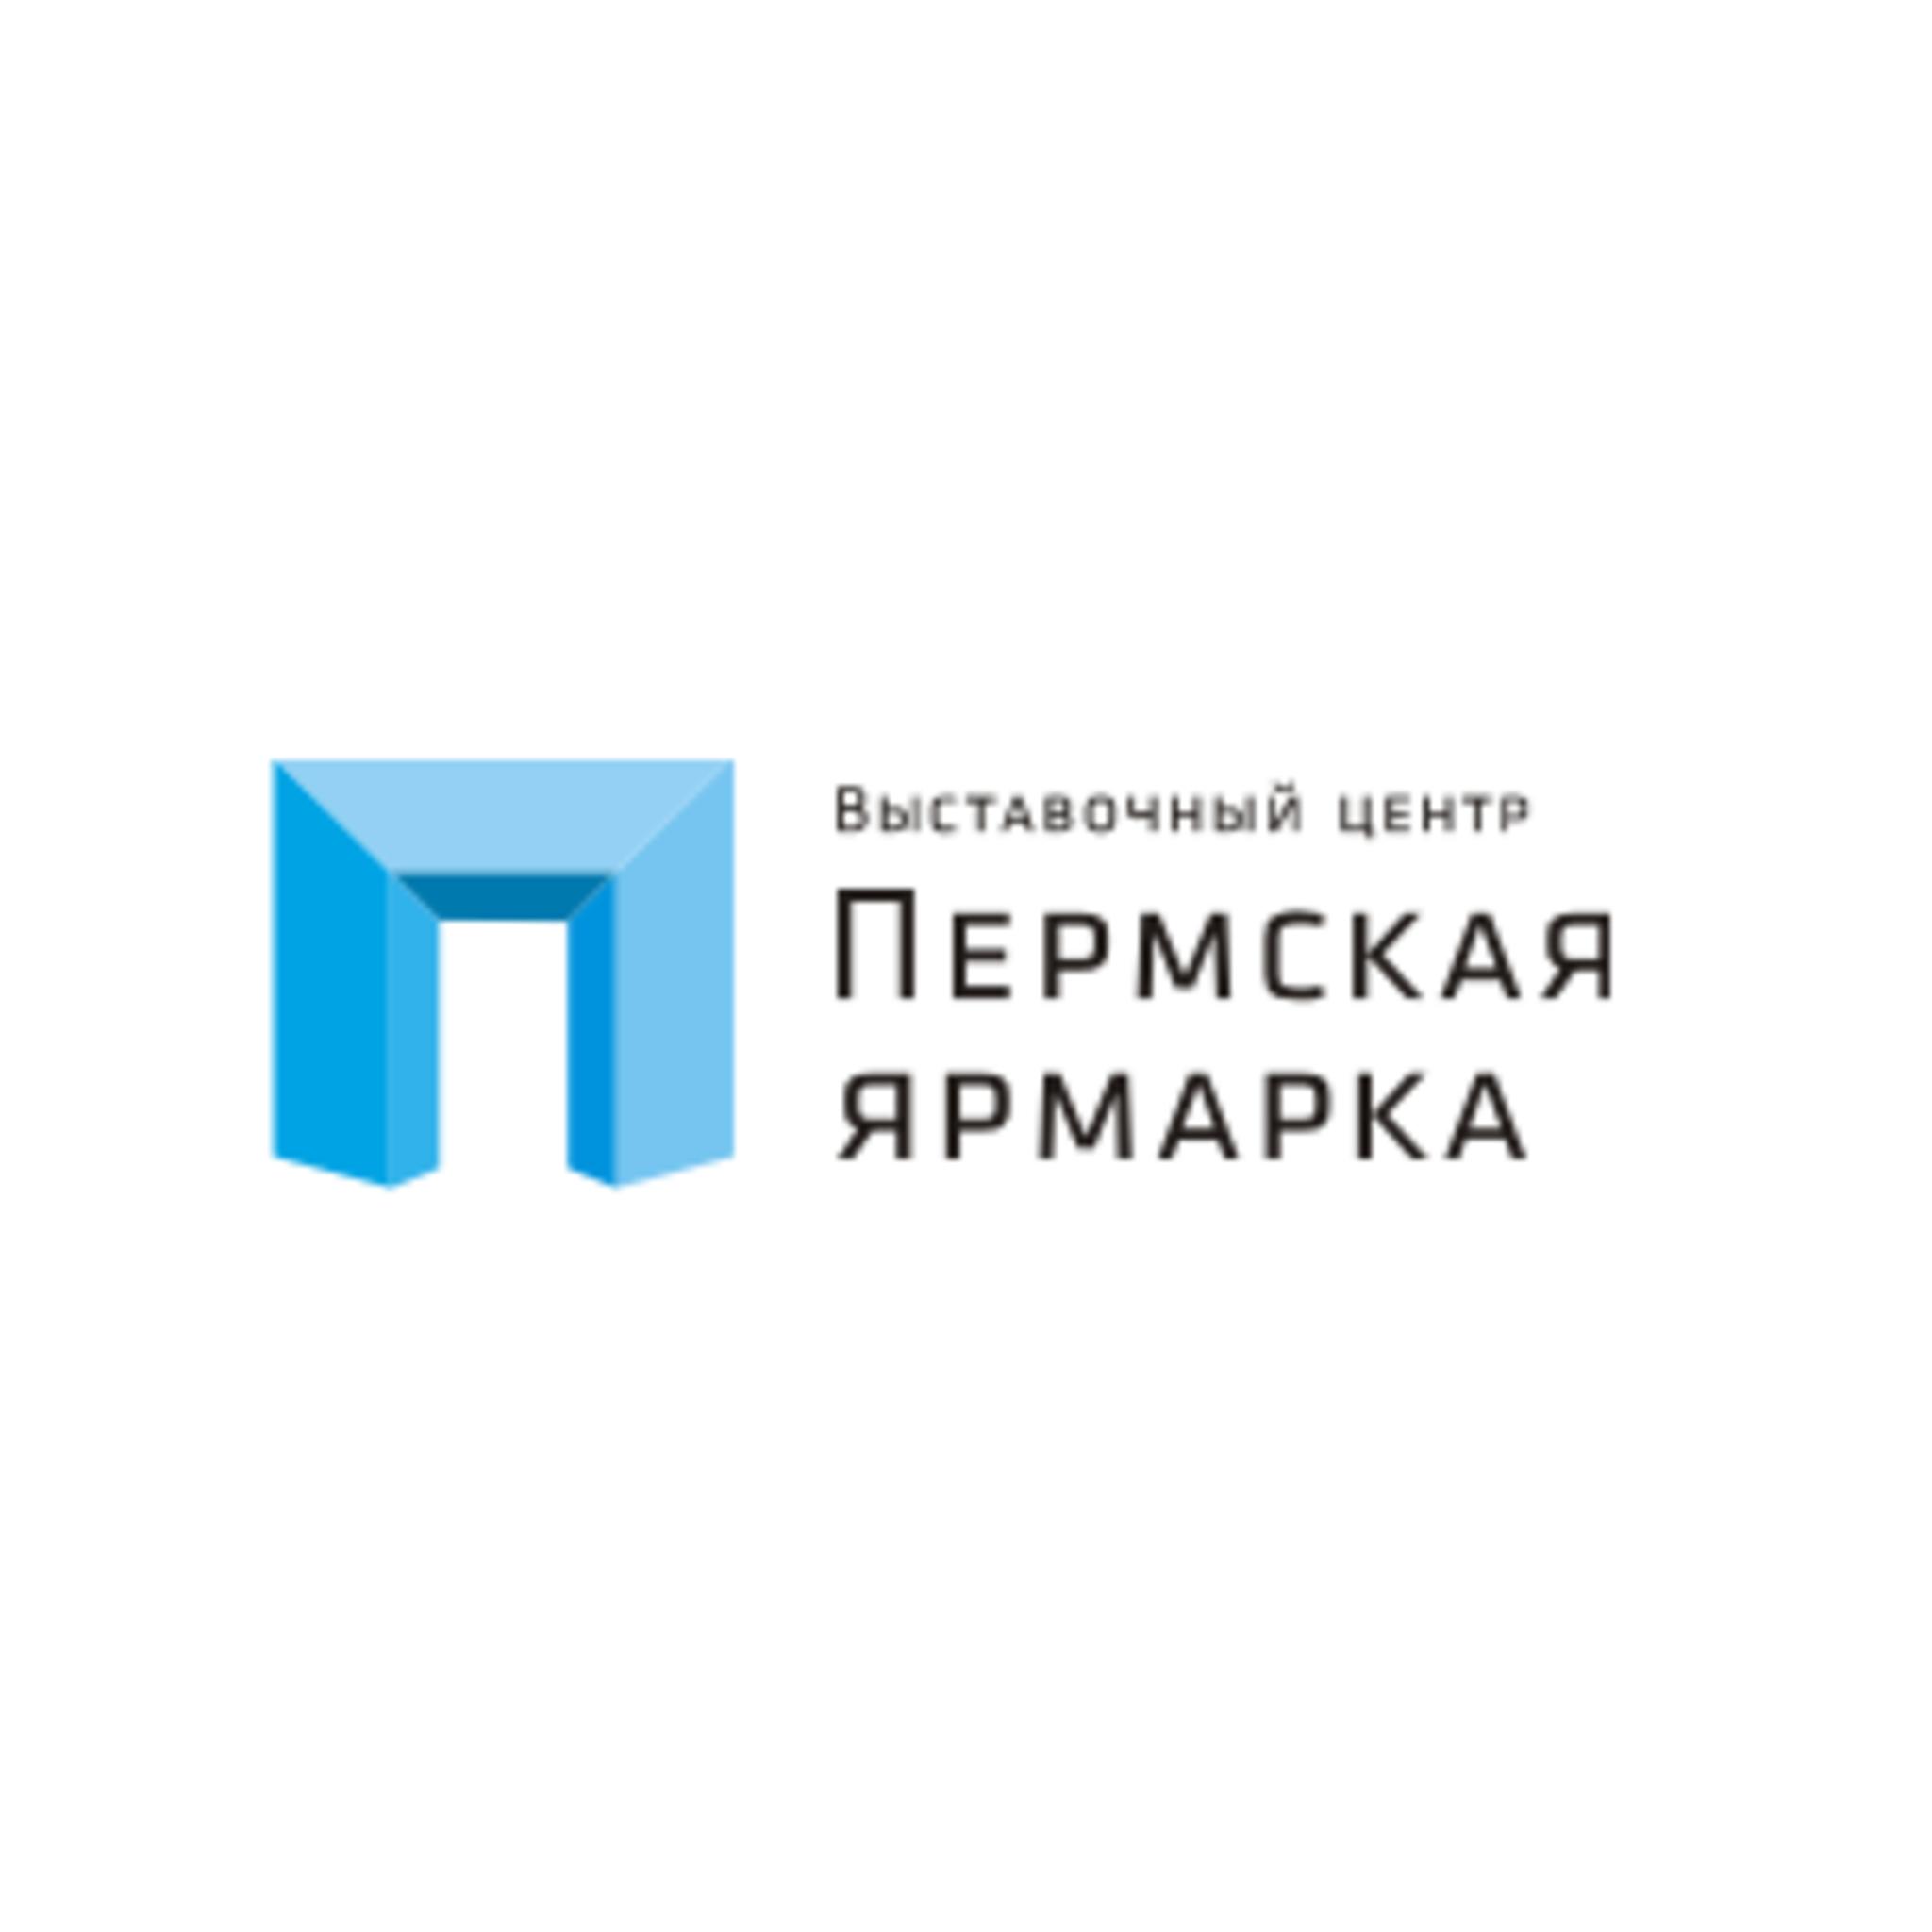 Выставочный центр Пермская ярмарка